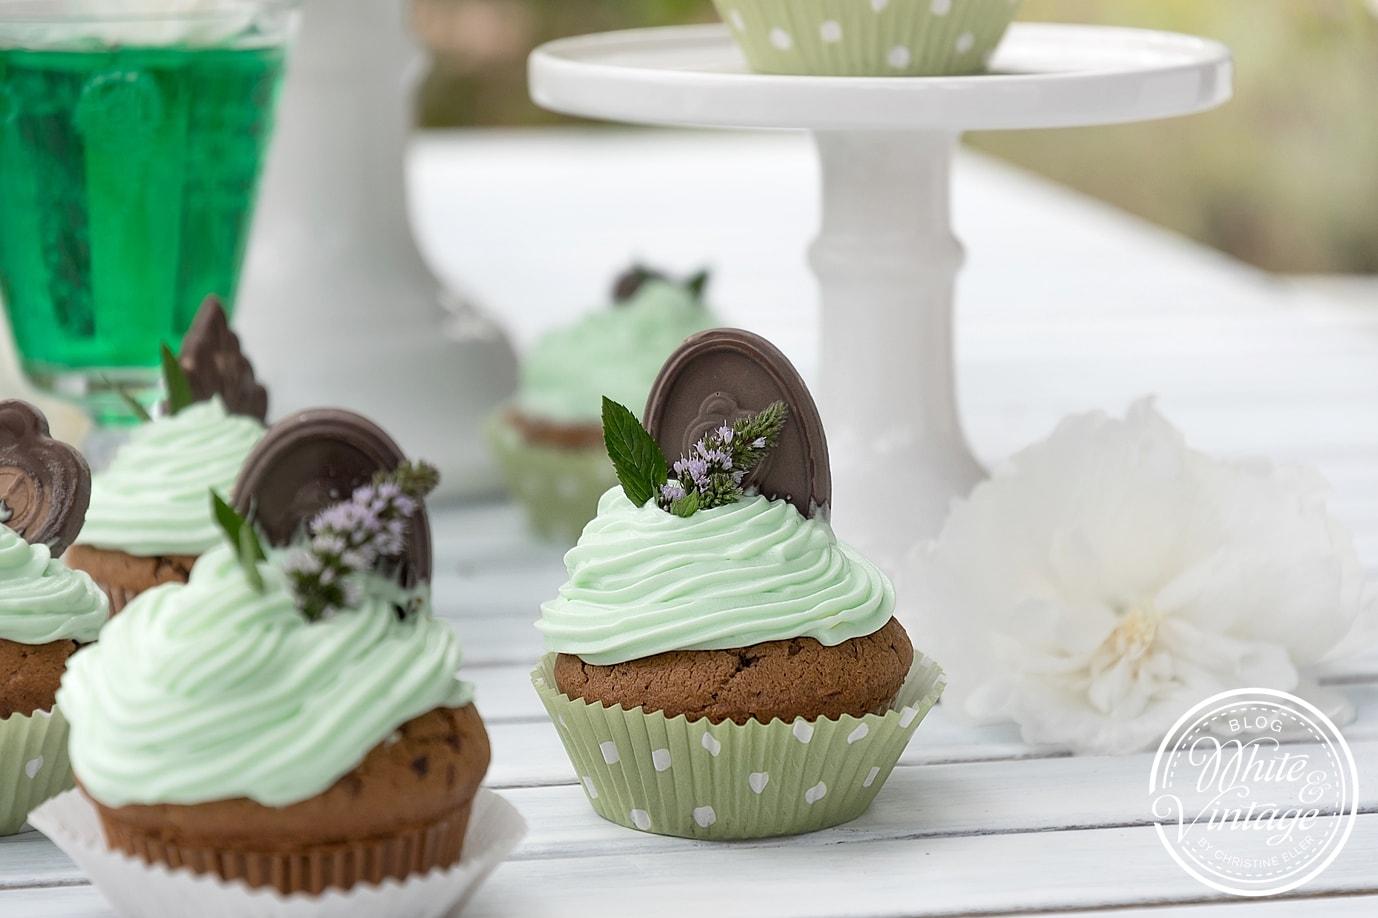 Rezept Schoko-Pfefferminz-Cupcakes